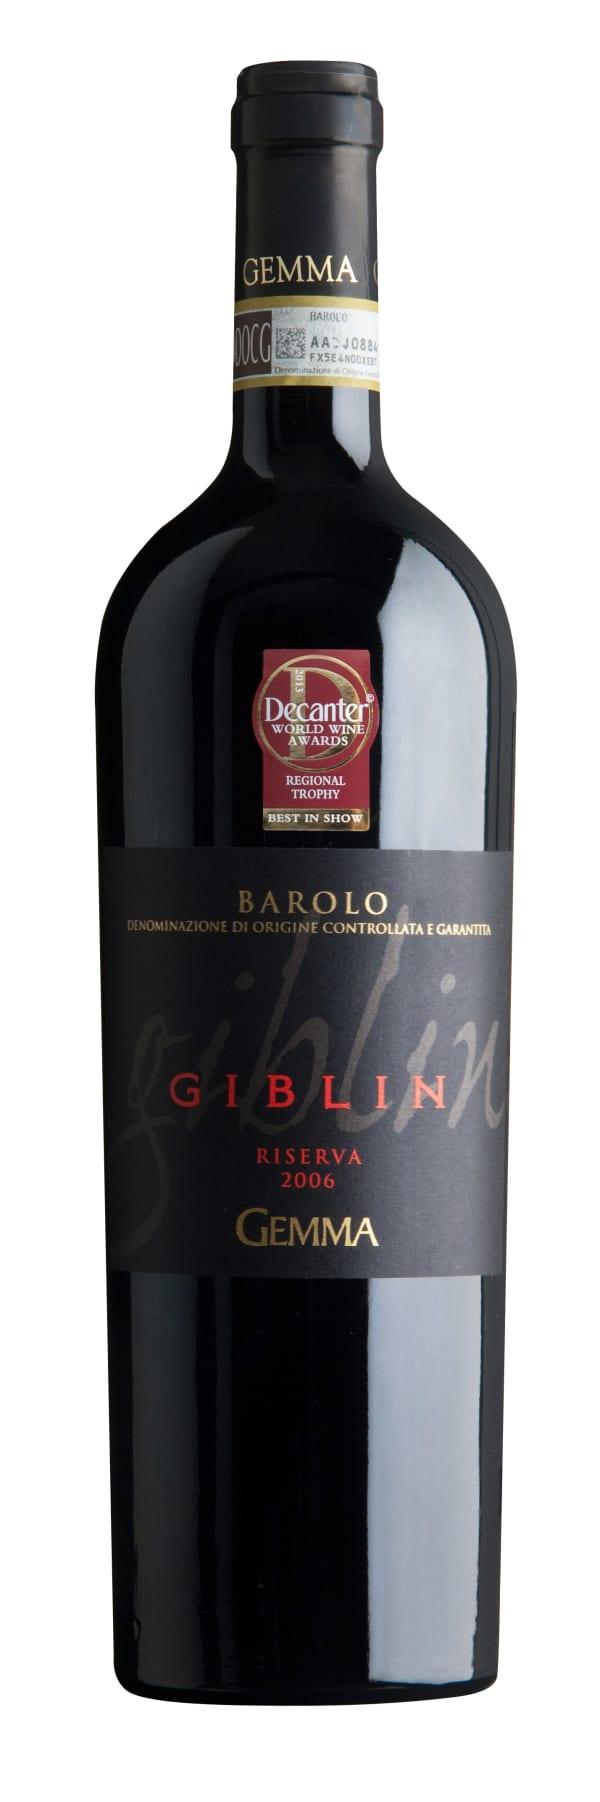 Barolo Giblin 2009